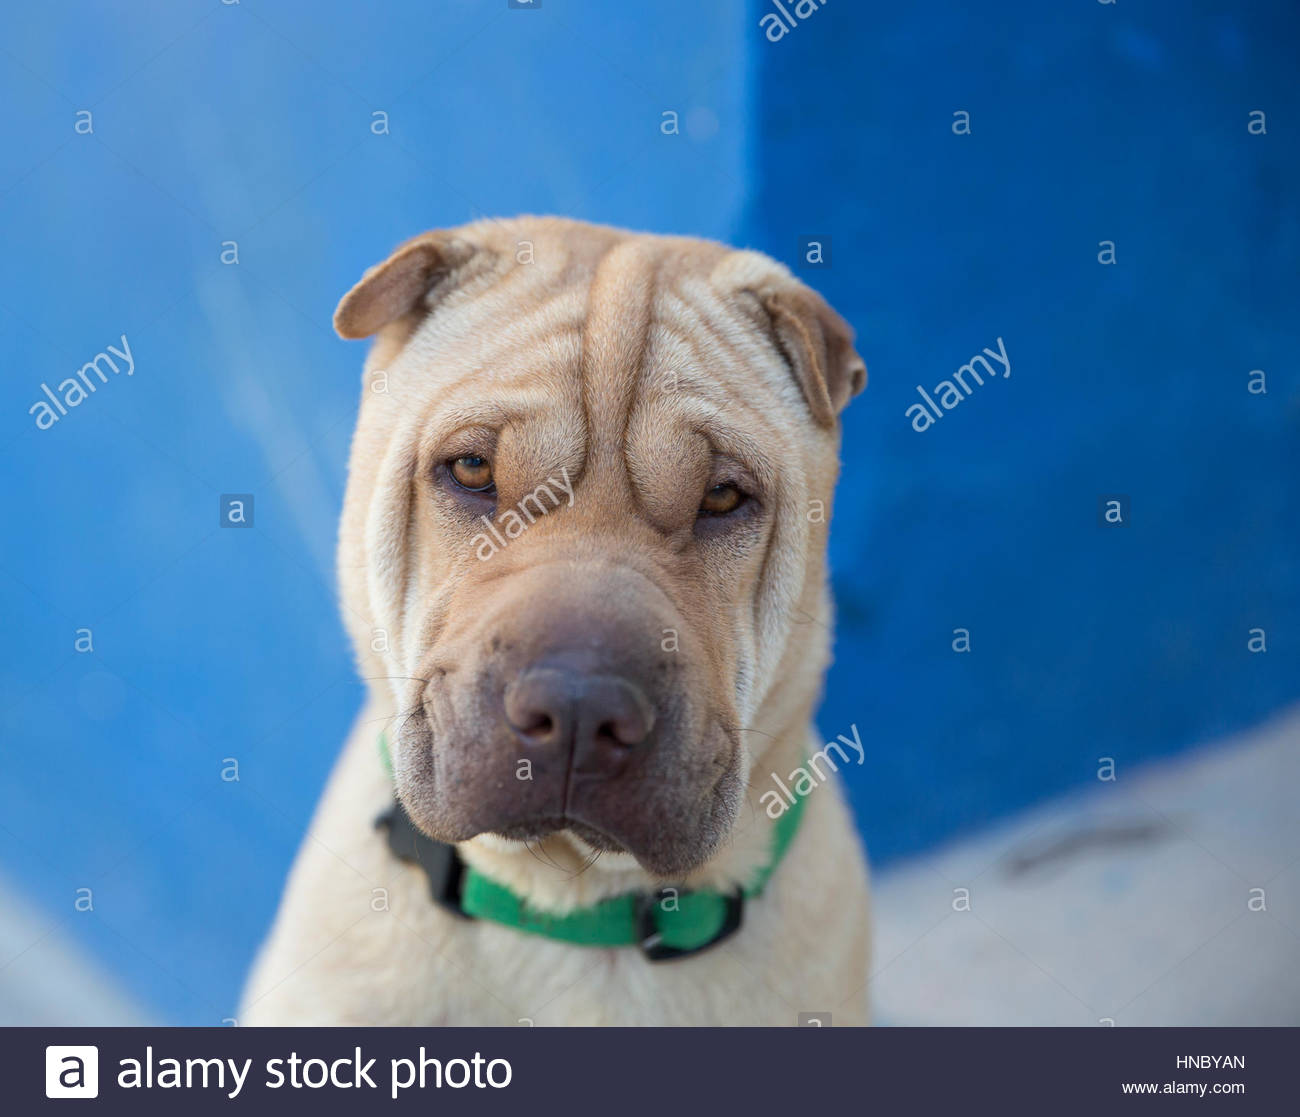 A Shar Pei dog in Trinidad, Cuba. - Stock Image